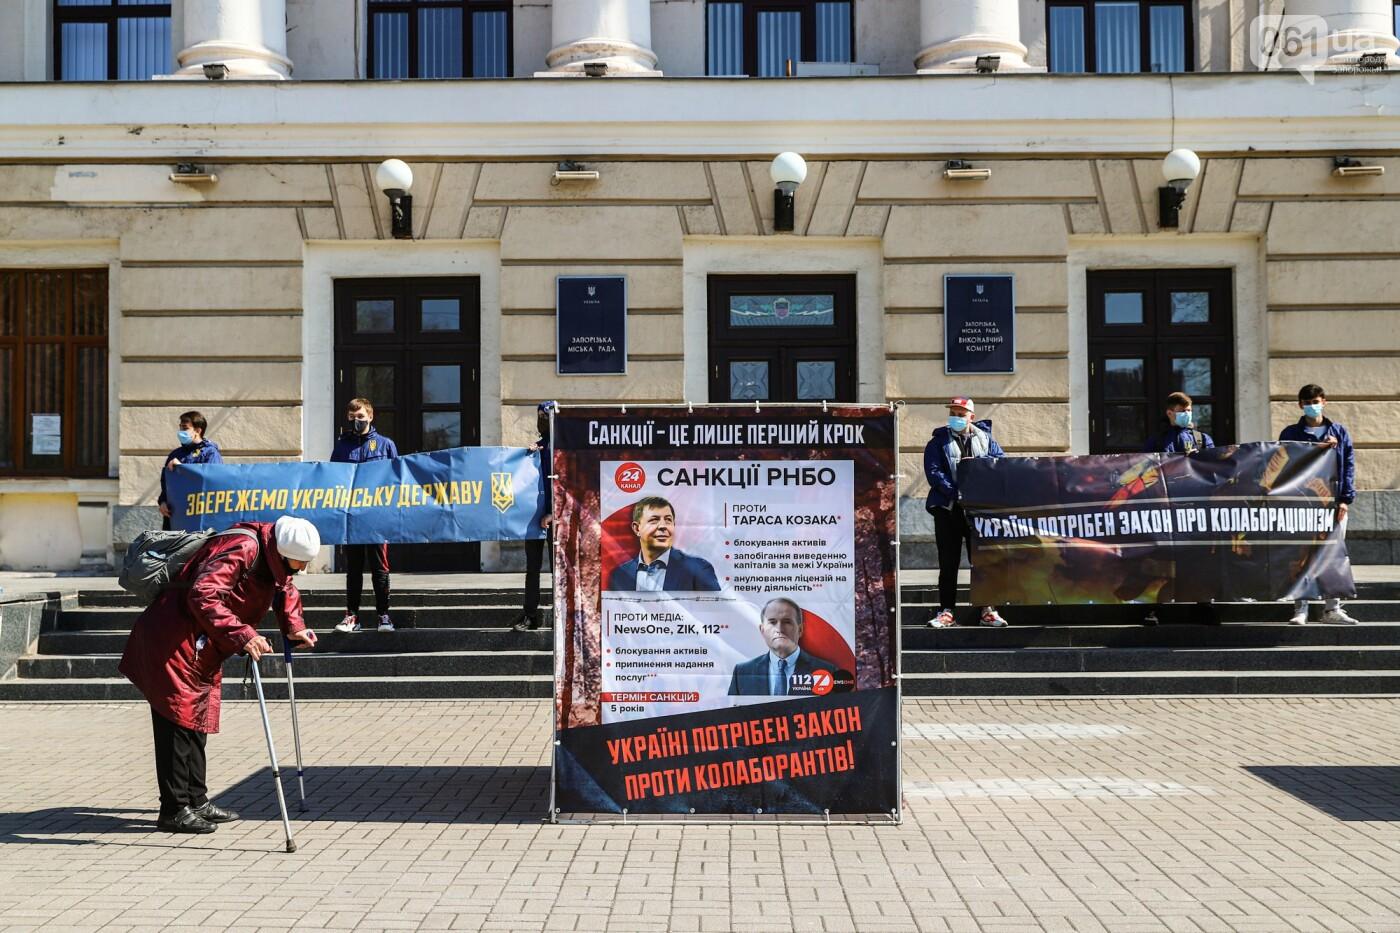 В Запорожье возле мэрии установили стенды с портретами Медведчука и Шария, - ФОТО, фото-16